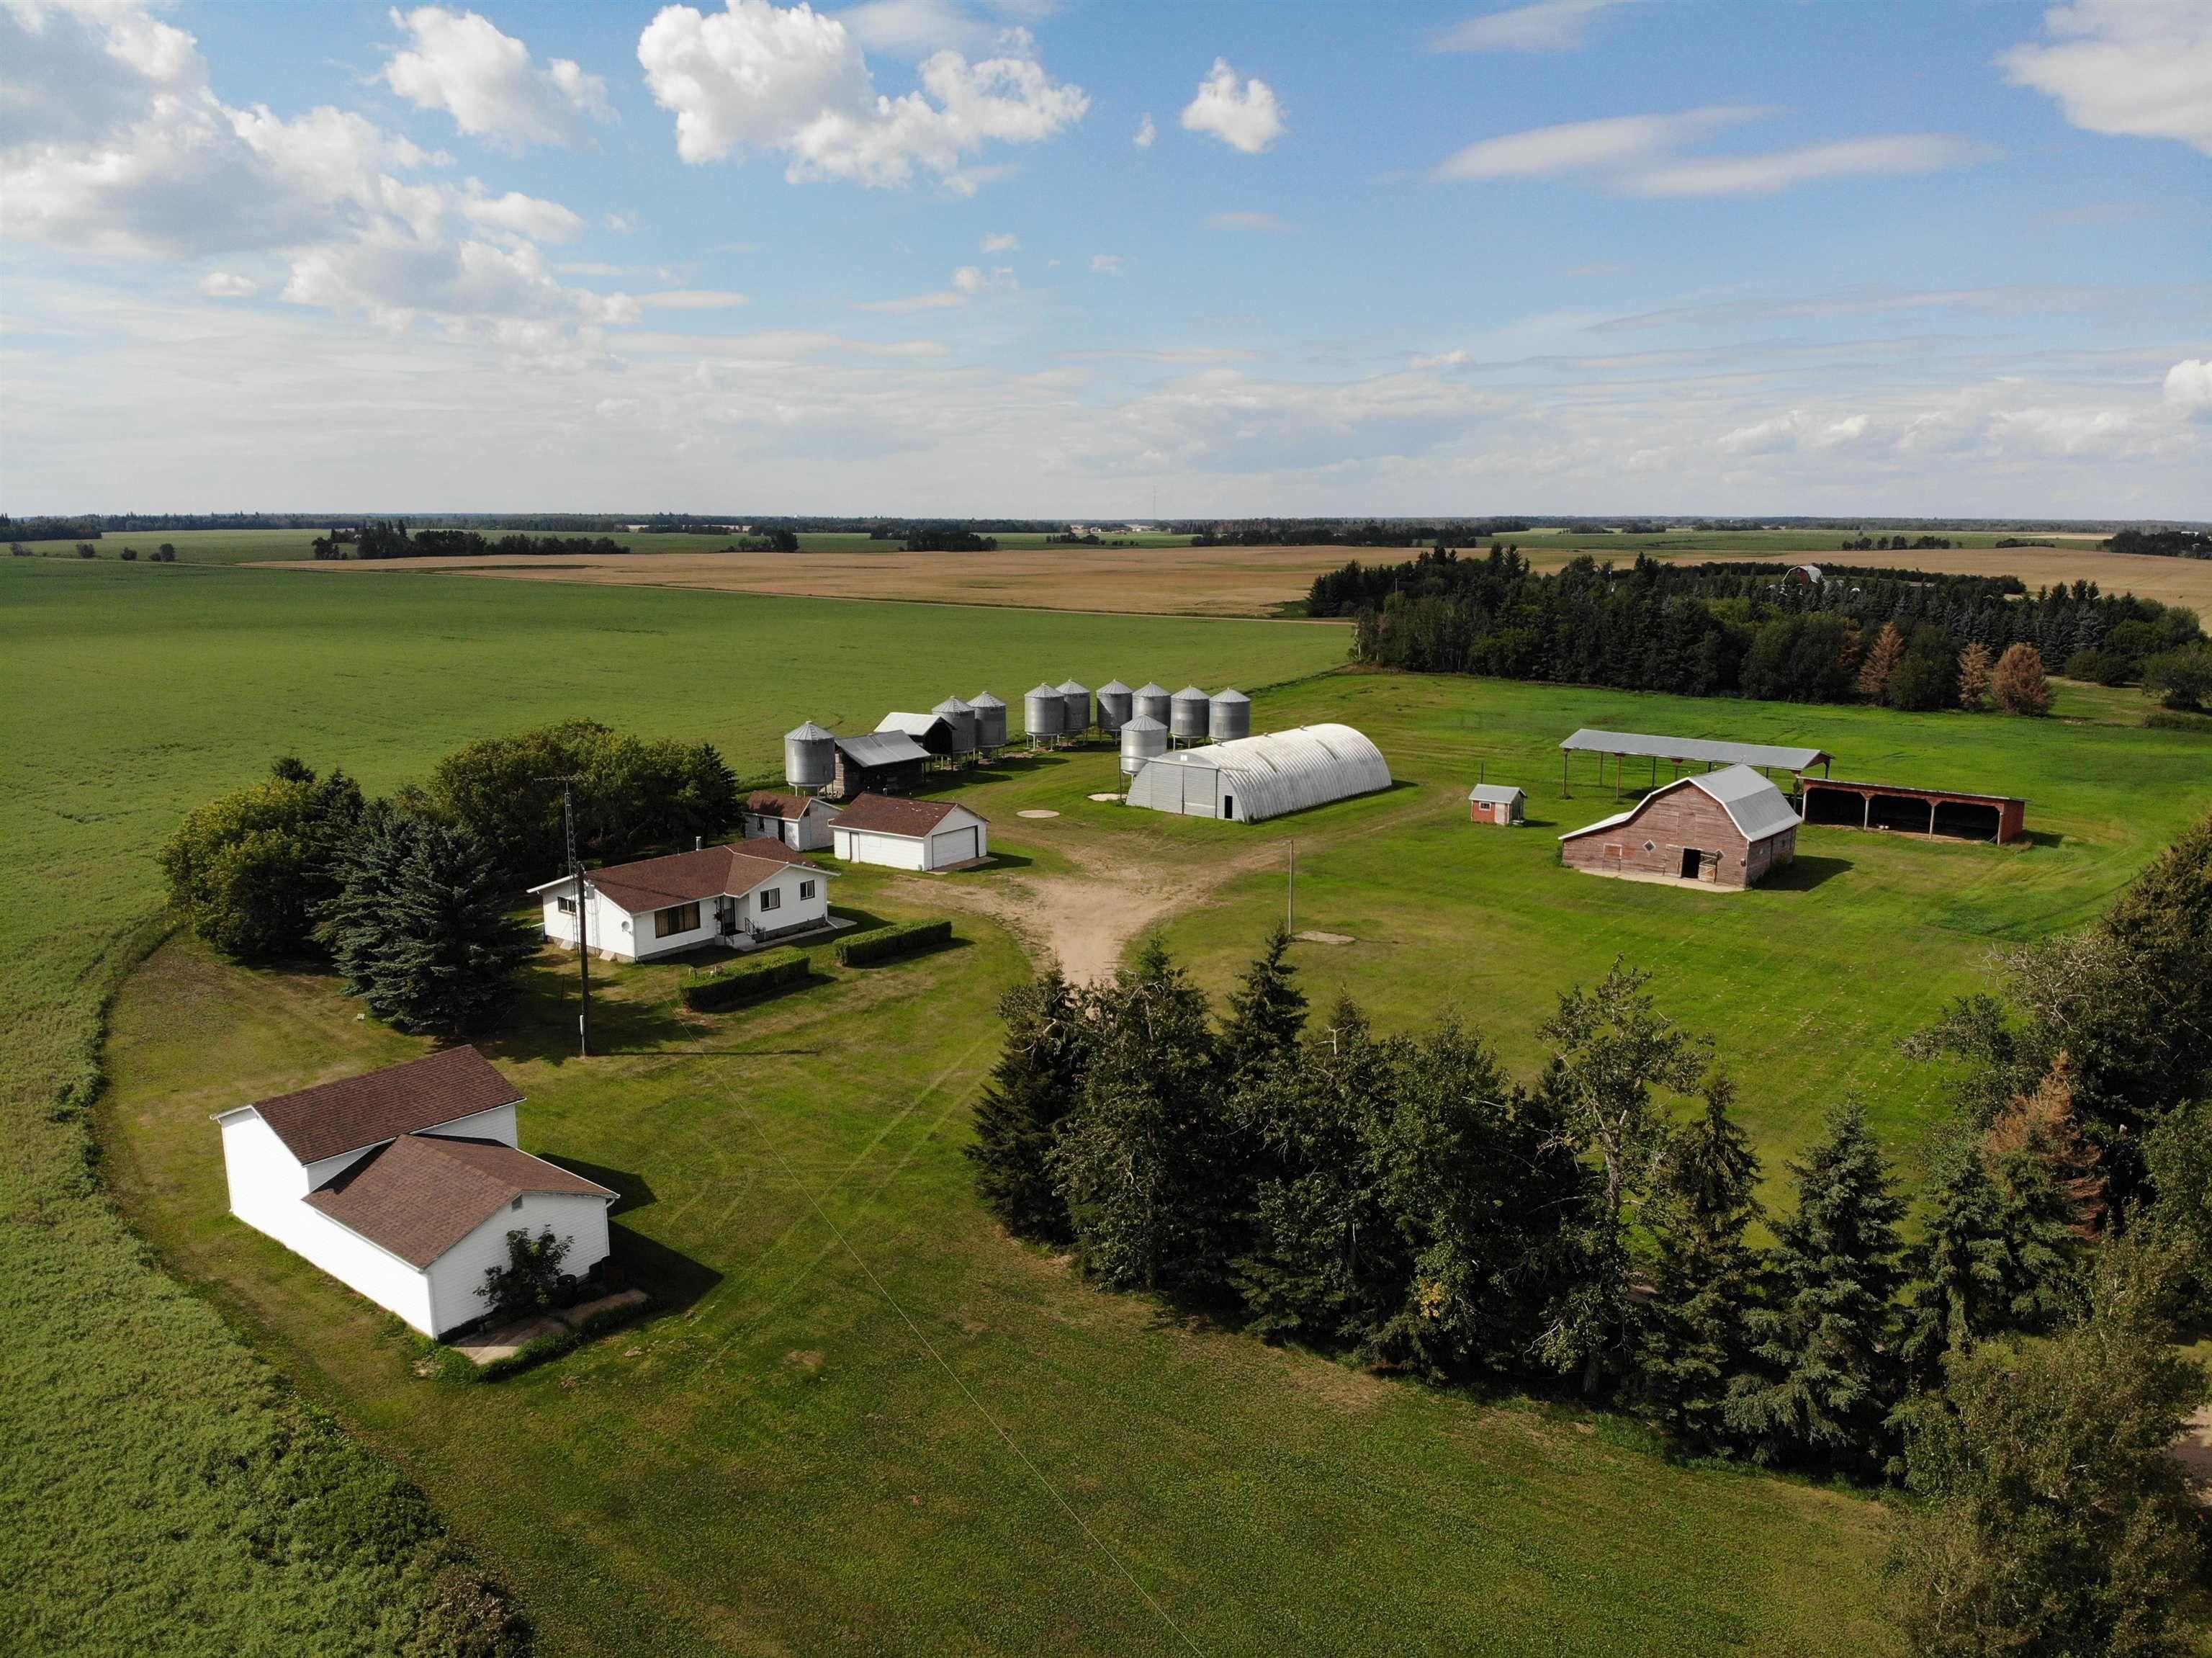 Main Photo: 59328 RR 212: Rural Thorhild County House for sale : MLS®# E4259024